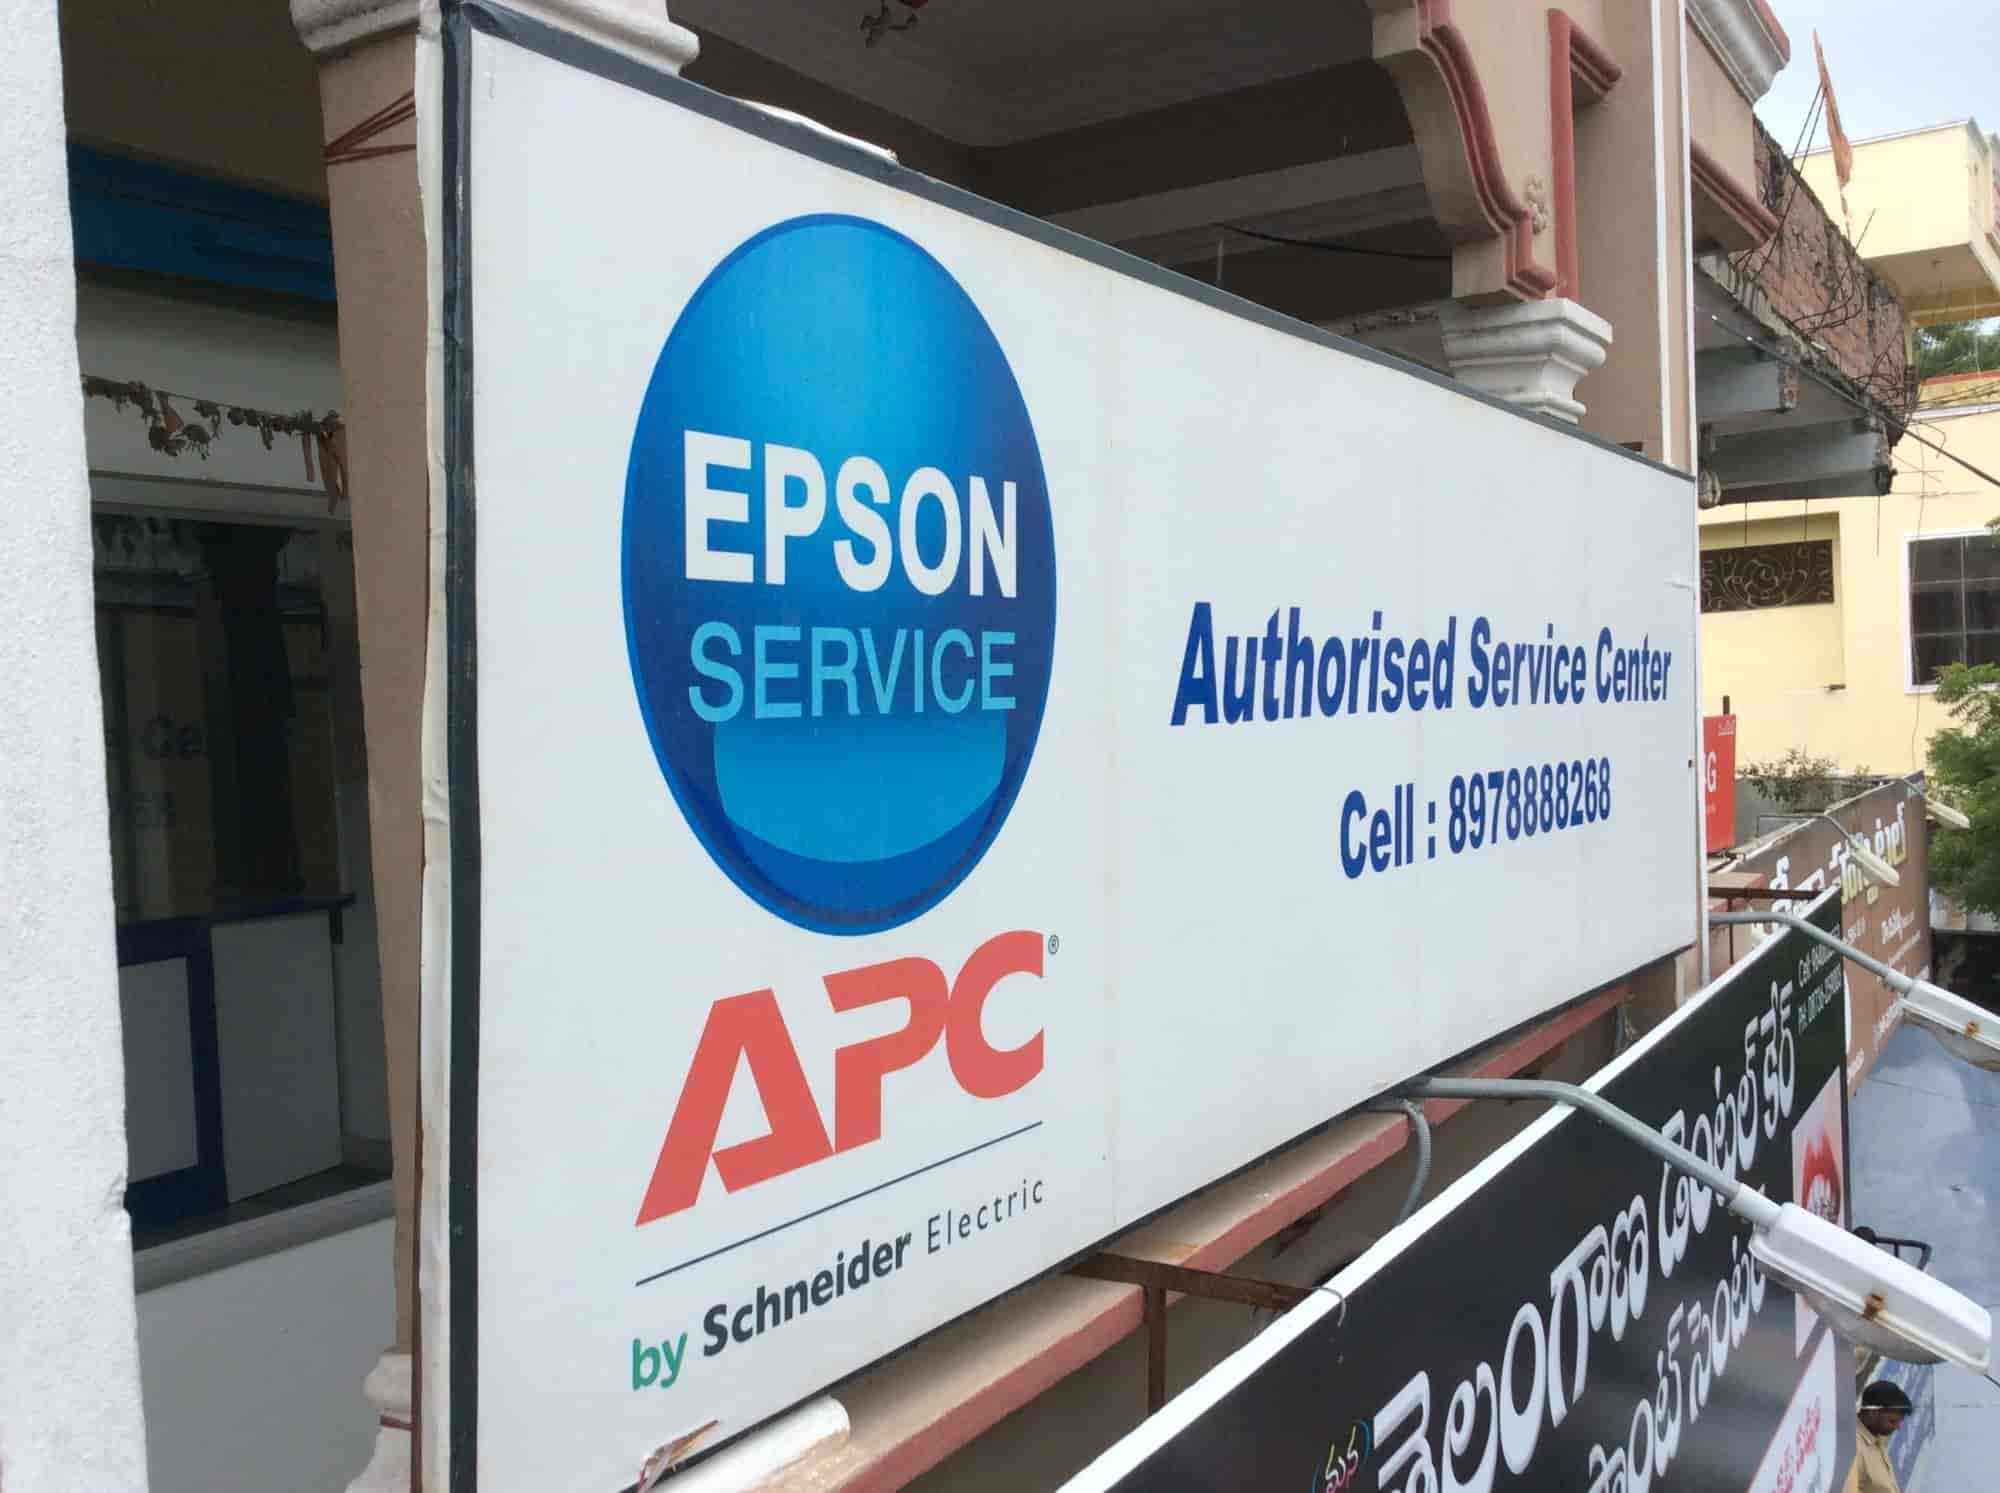 Apc Epson Service Centre, Mancherial Ho - Computer Repair